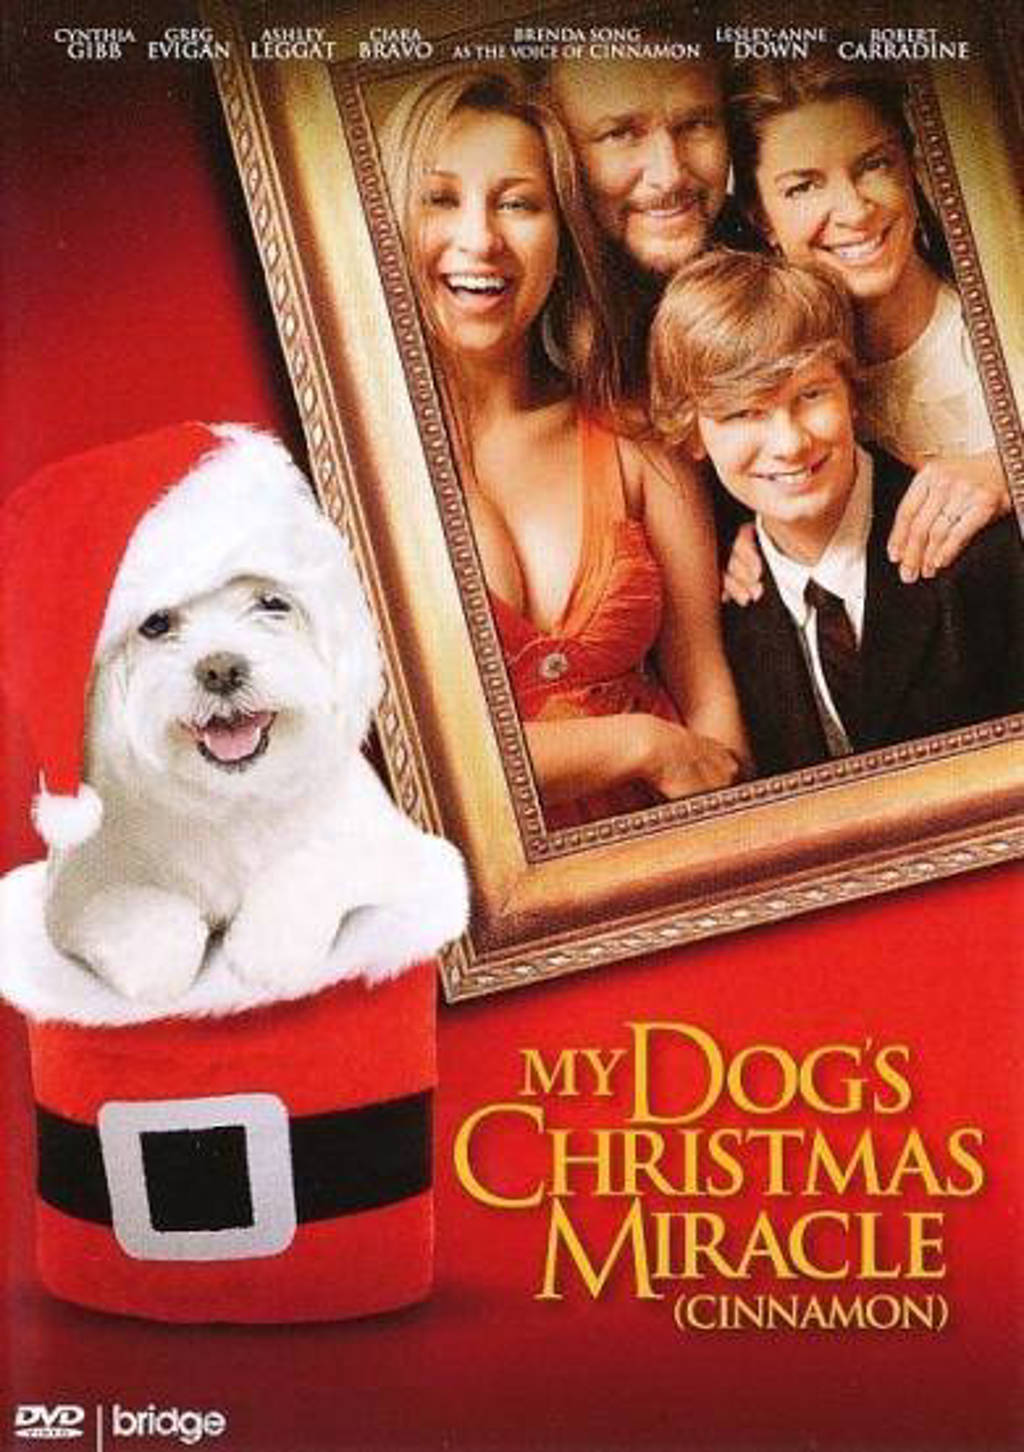 My dog's christmas miracle (DVD)